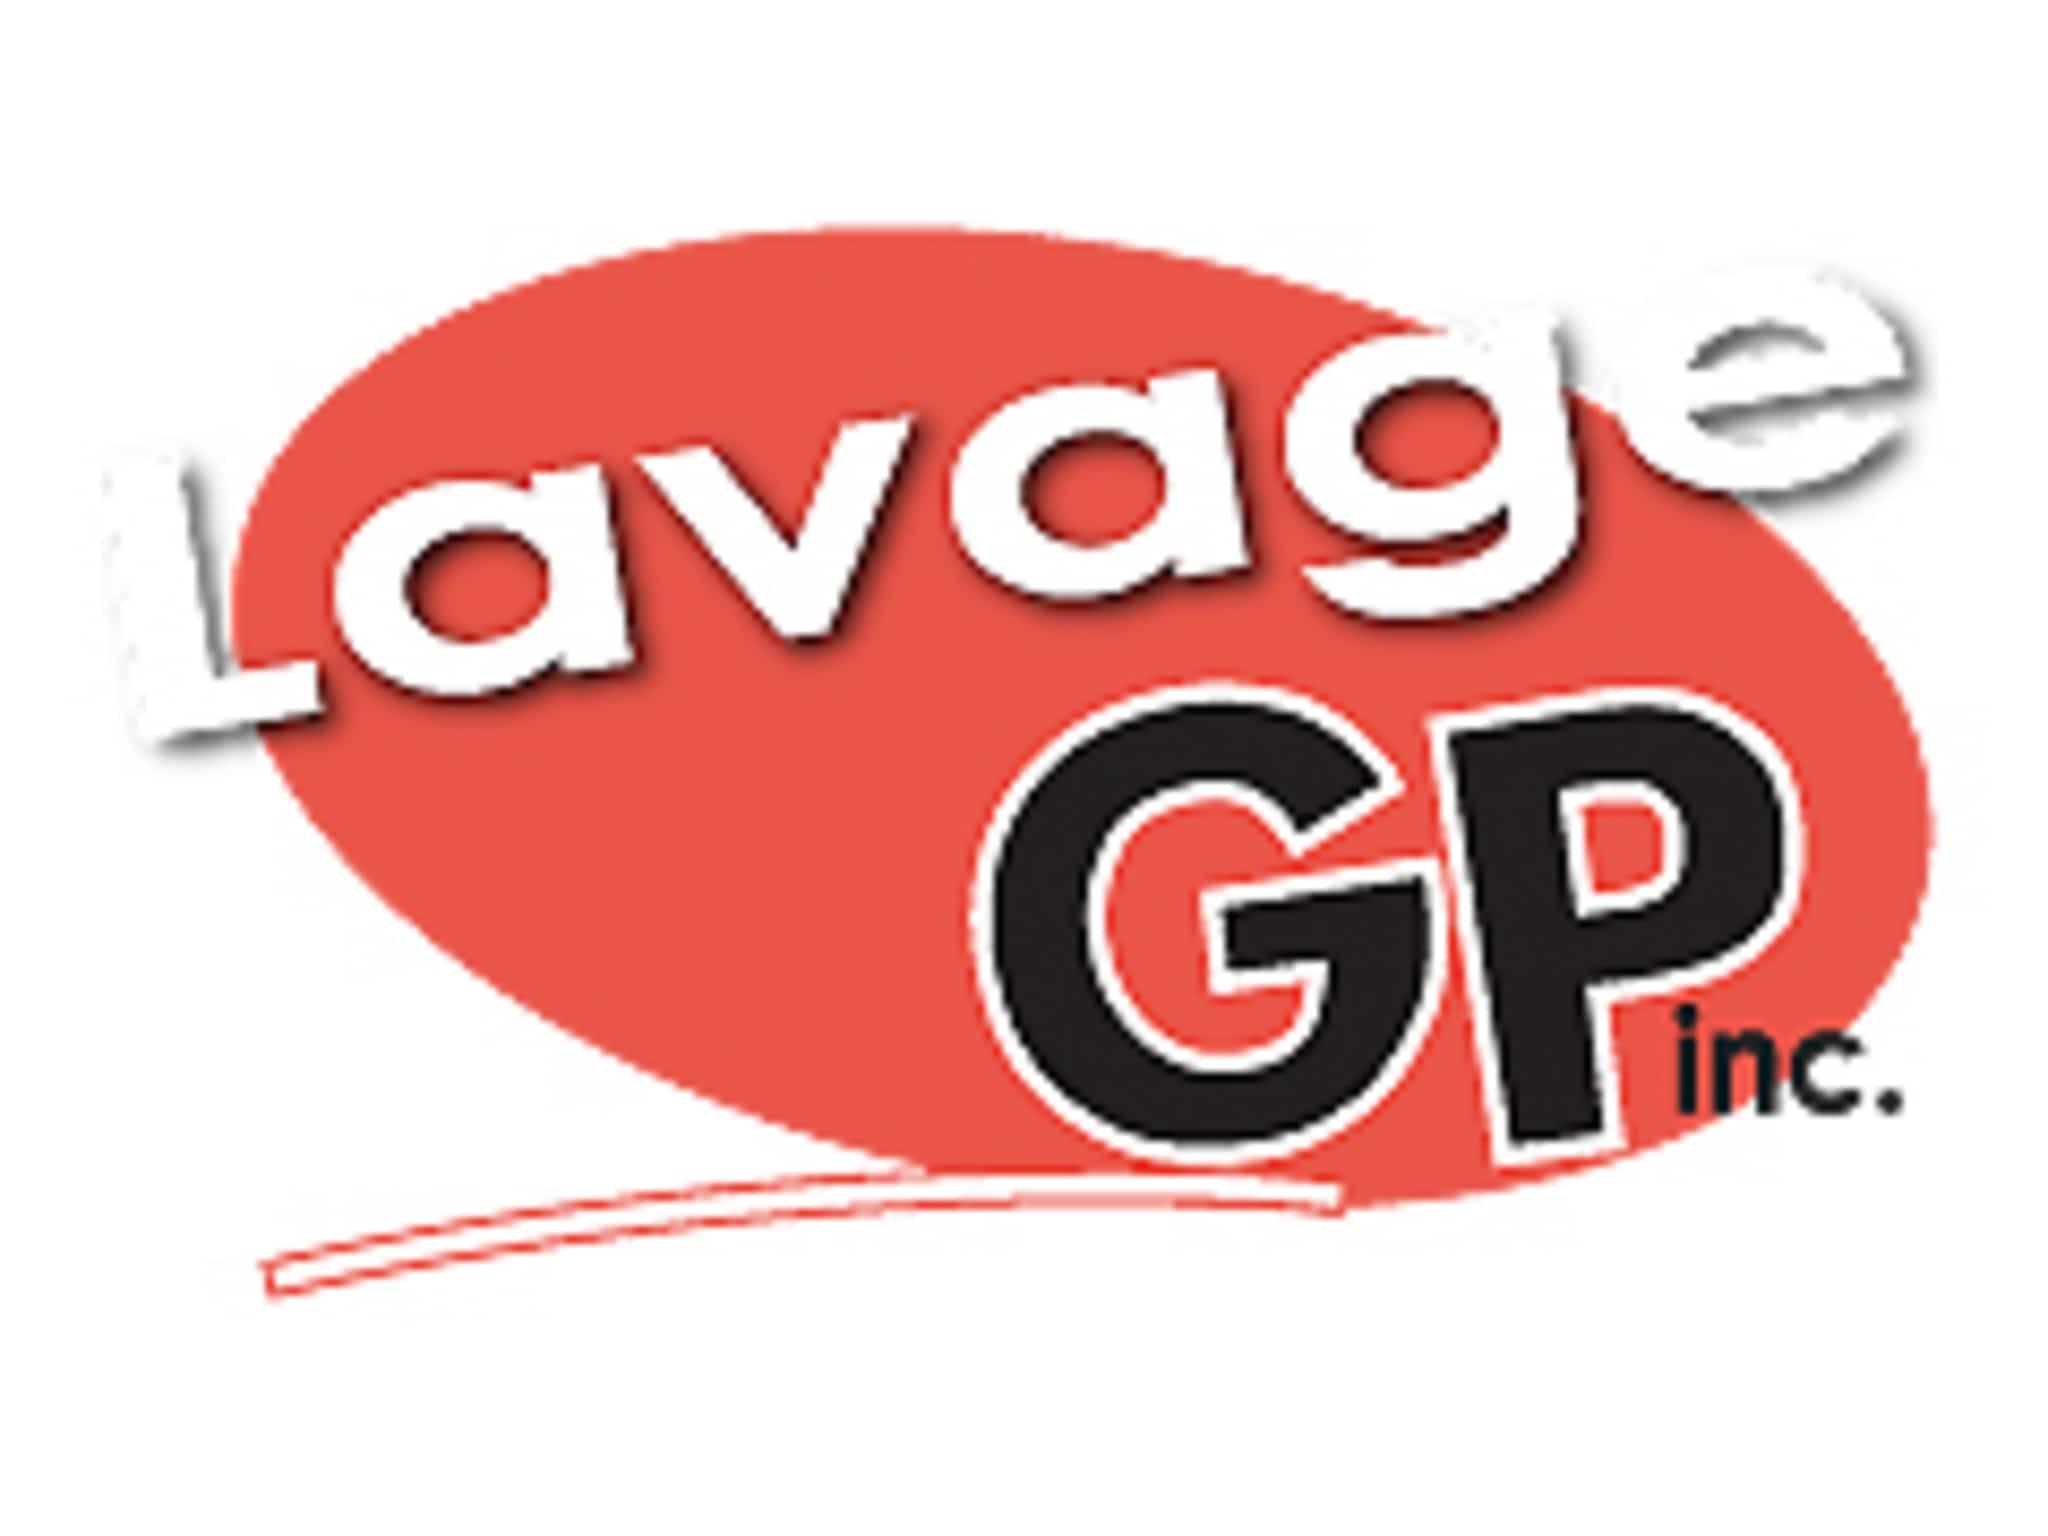 photo Lavage G P